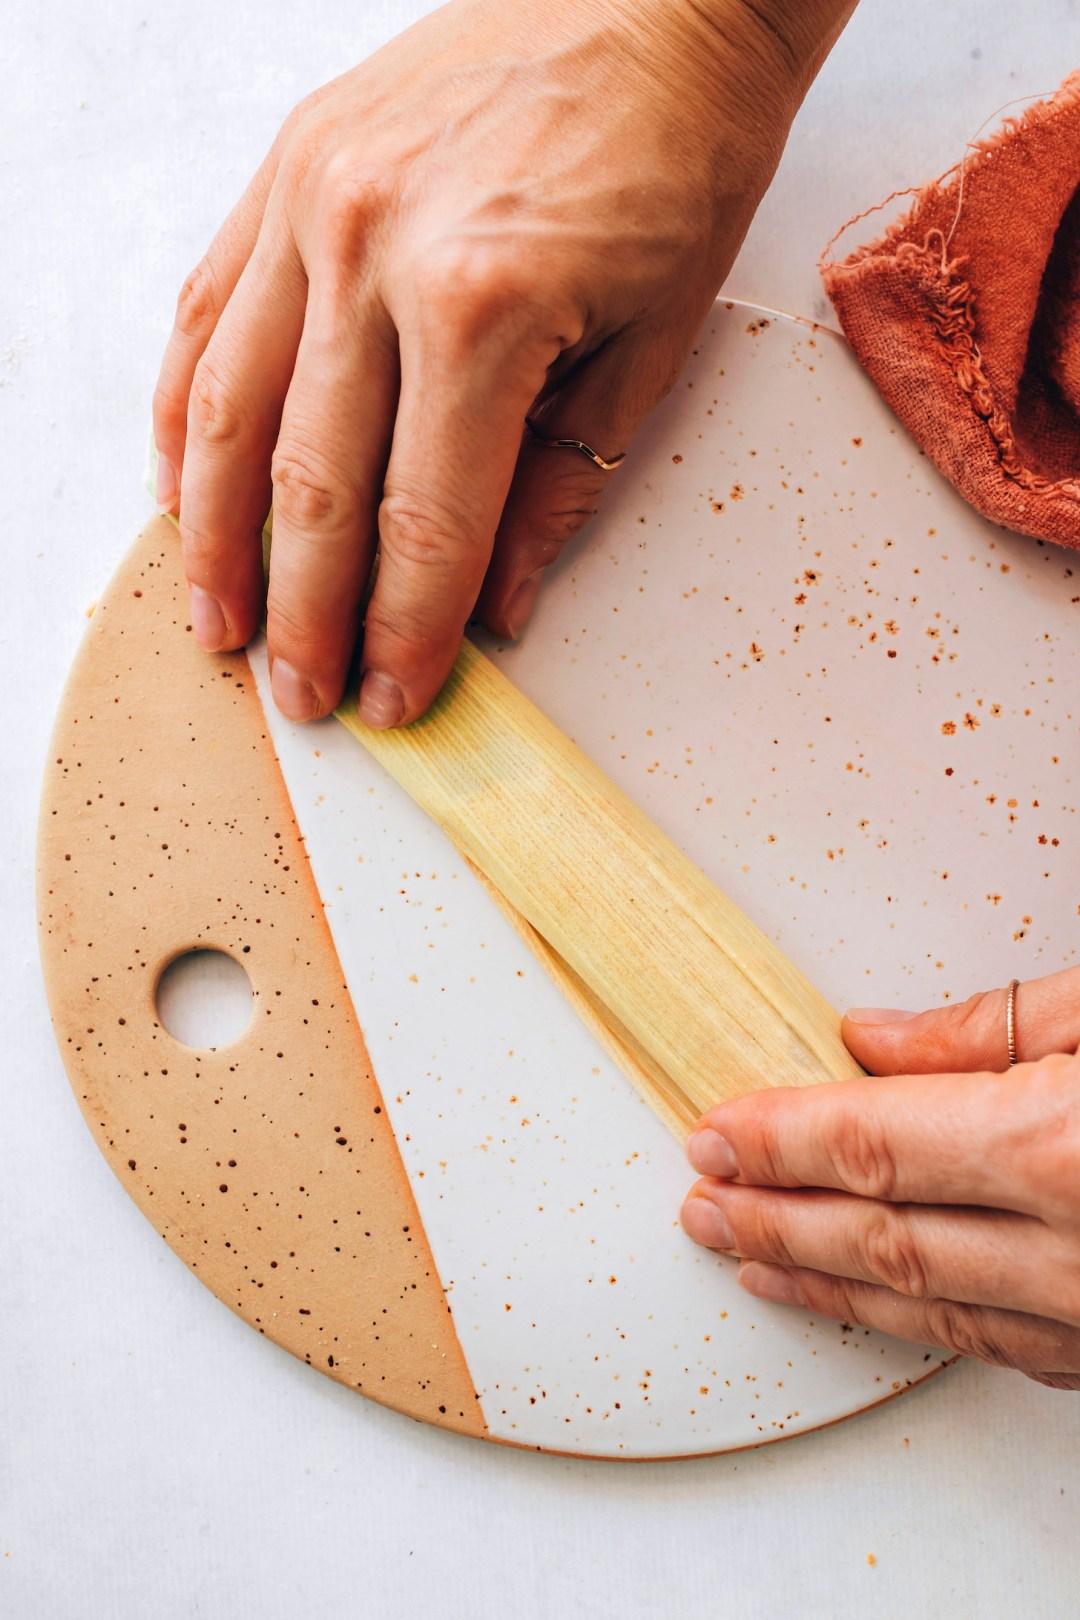 Tamale rolled in a corn husk